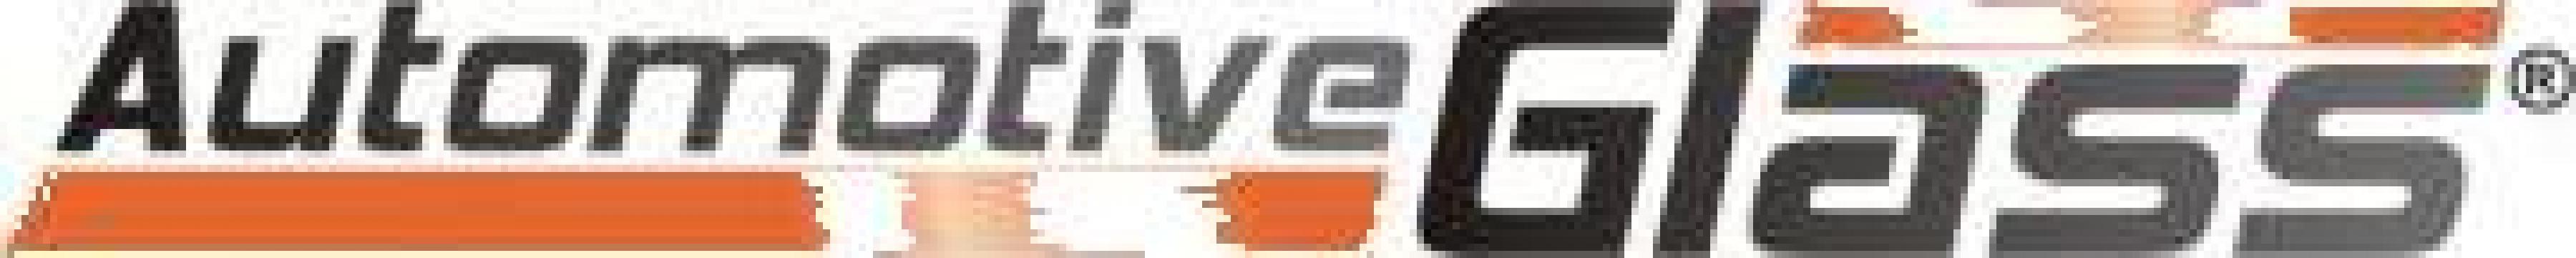 Montaj luneta Dacia Dokker, Duster, Lodgy, Logan, Sandero de la Automotive Glass Service Srl